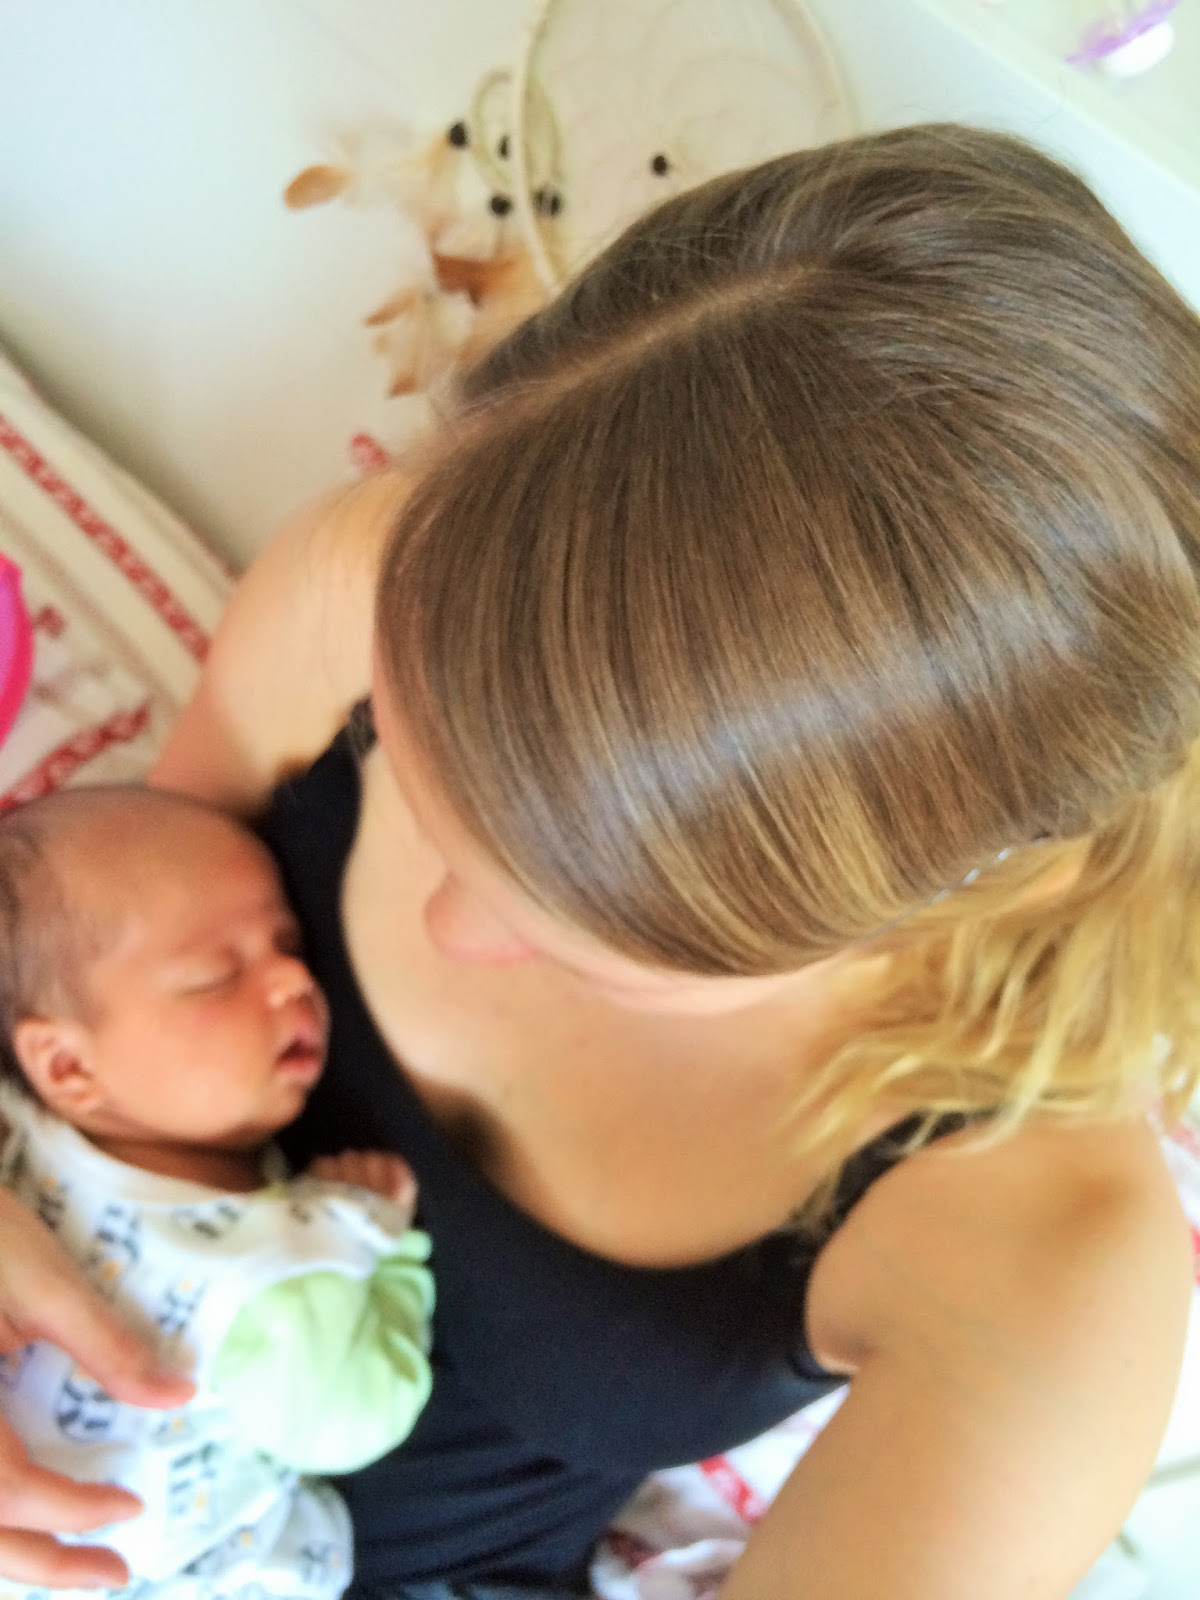 parhaat hetket vauvan kanssa